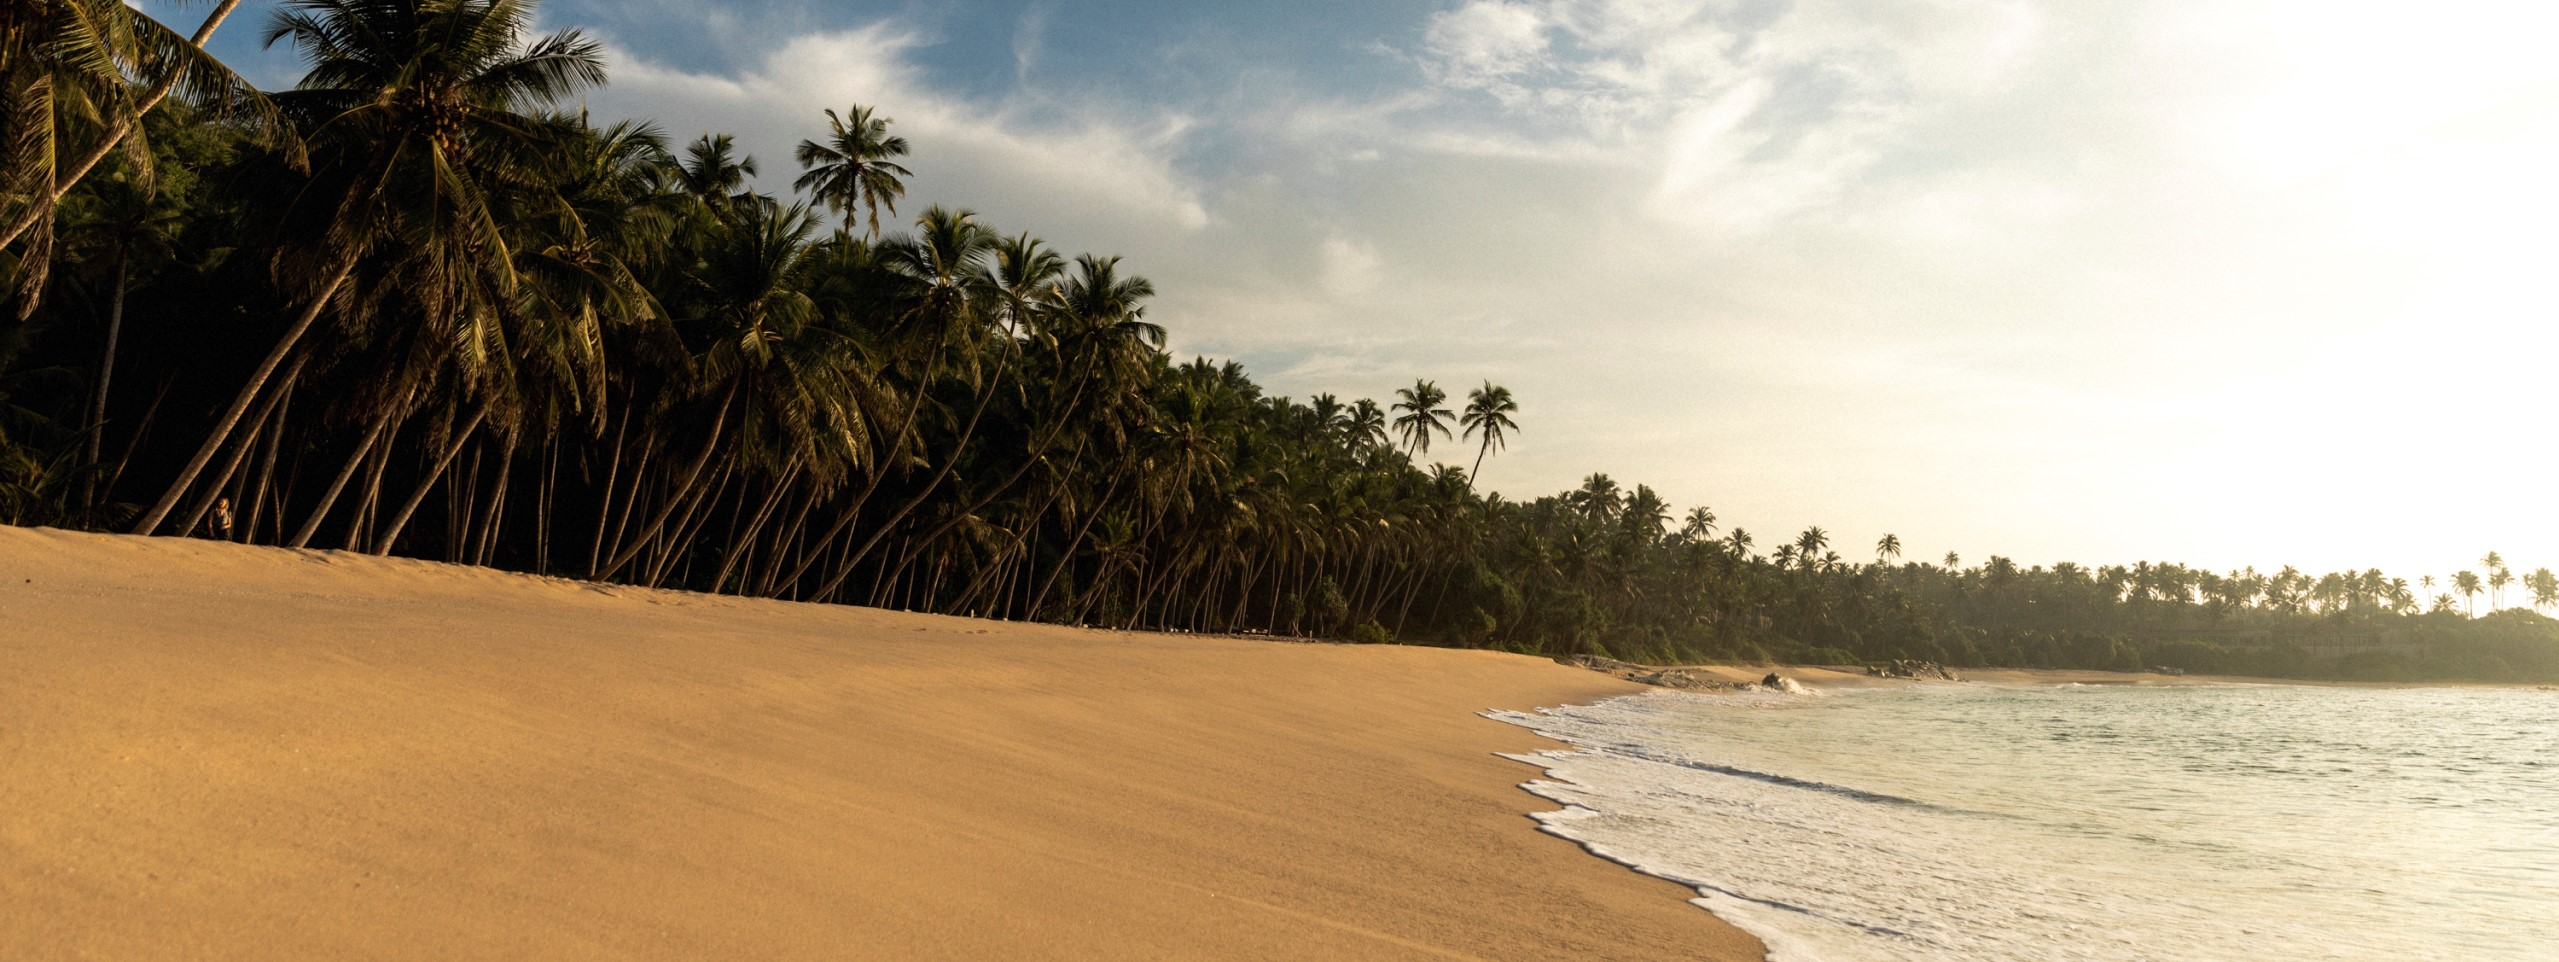 Amanwella-beach-Sri-Lanka